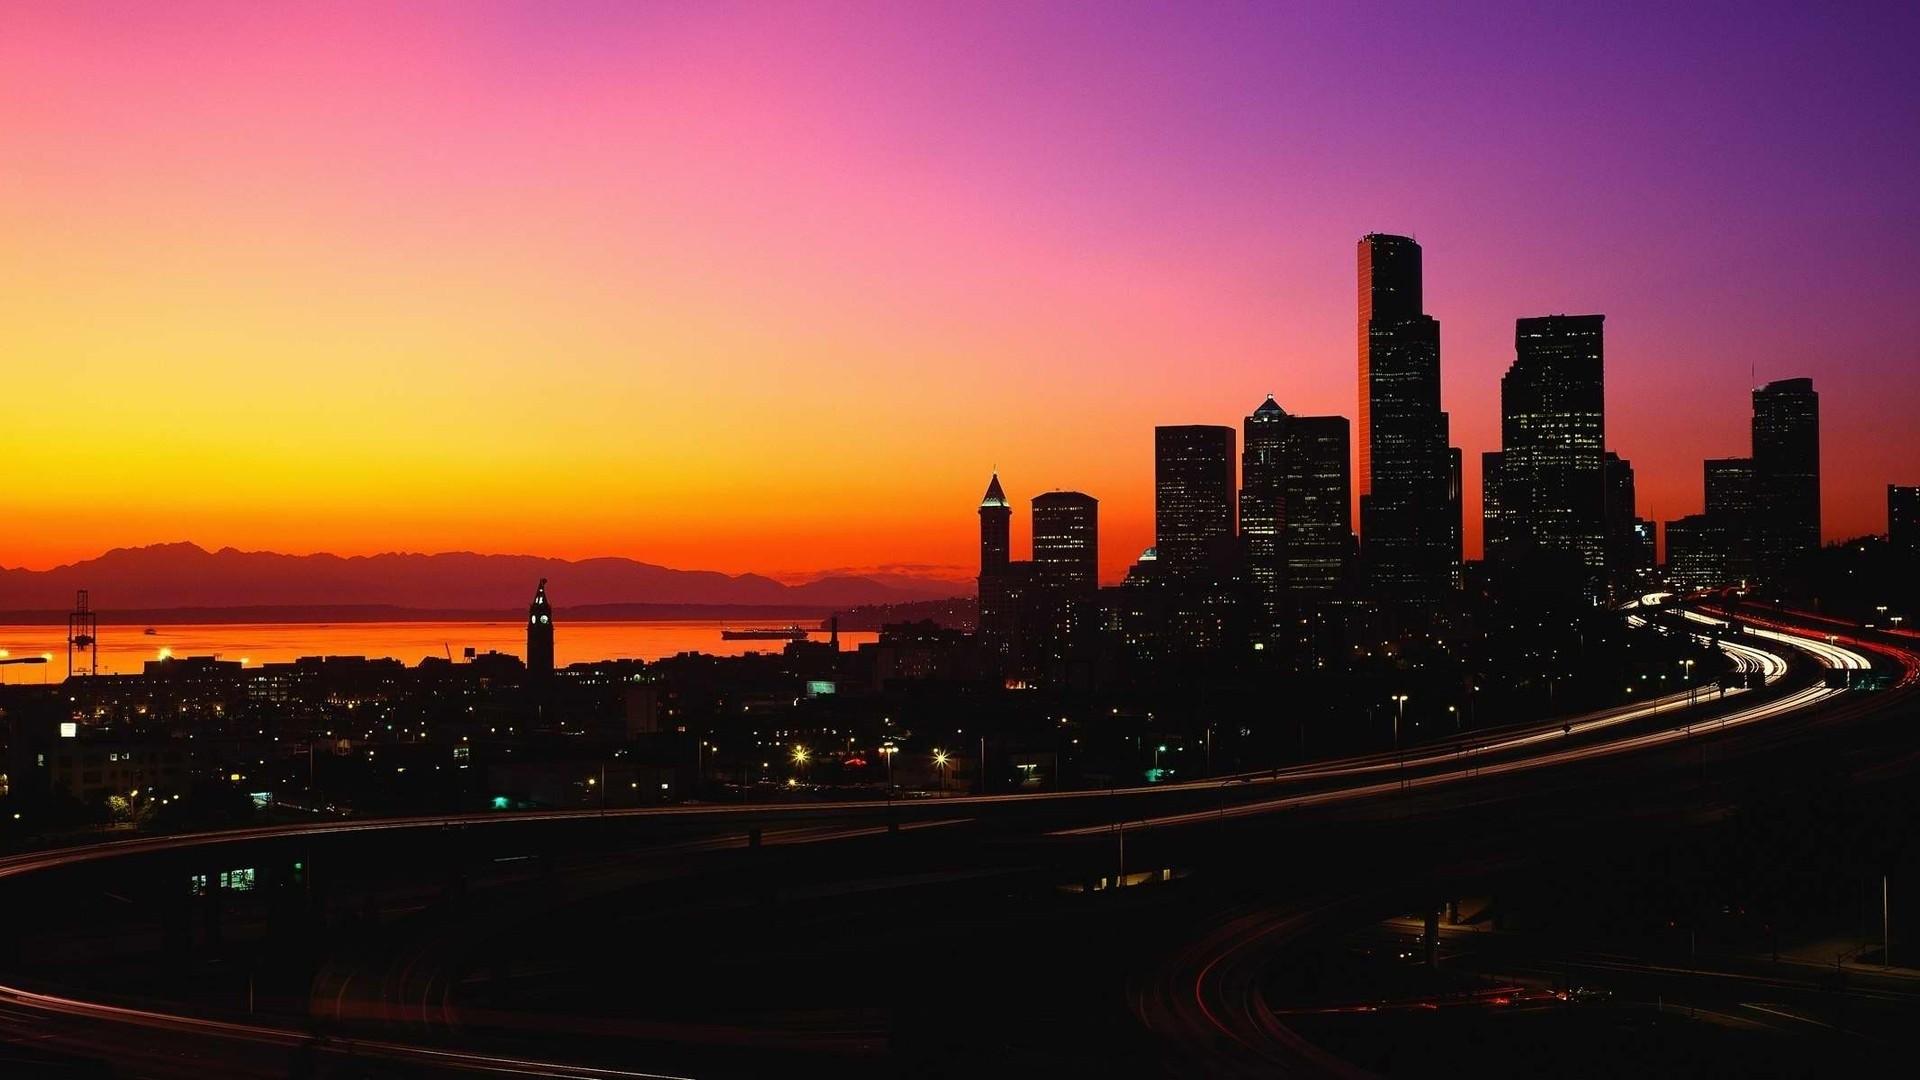 Sunsets: Twilight Sunsets Dusk City Sky Colorful Cityscape Sunset ...